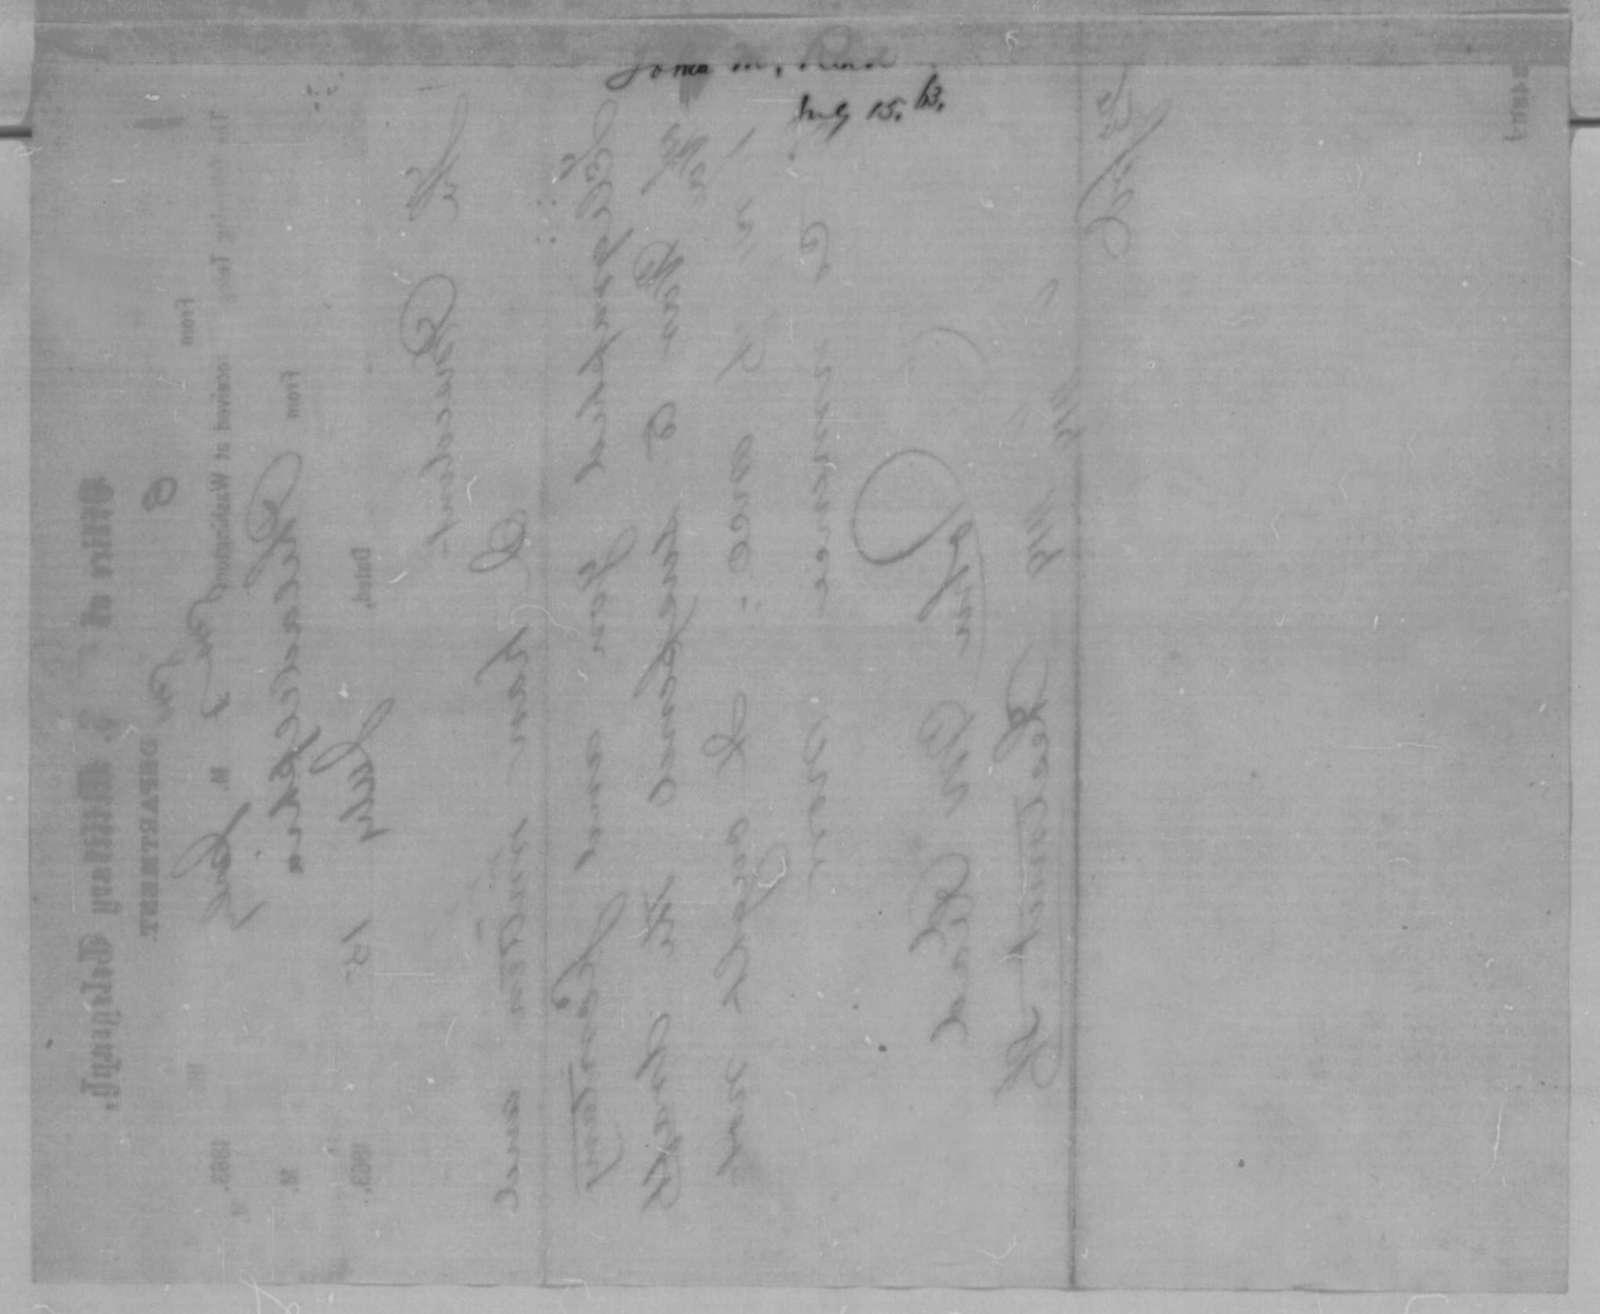 John M. Read to Abraham Lincoln, Wednesday, July 15, 1863  (Telegram recommending suspension of draft in Philadelphia)